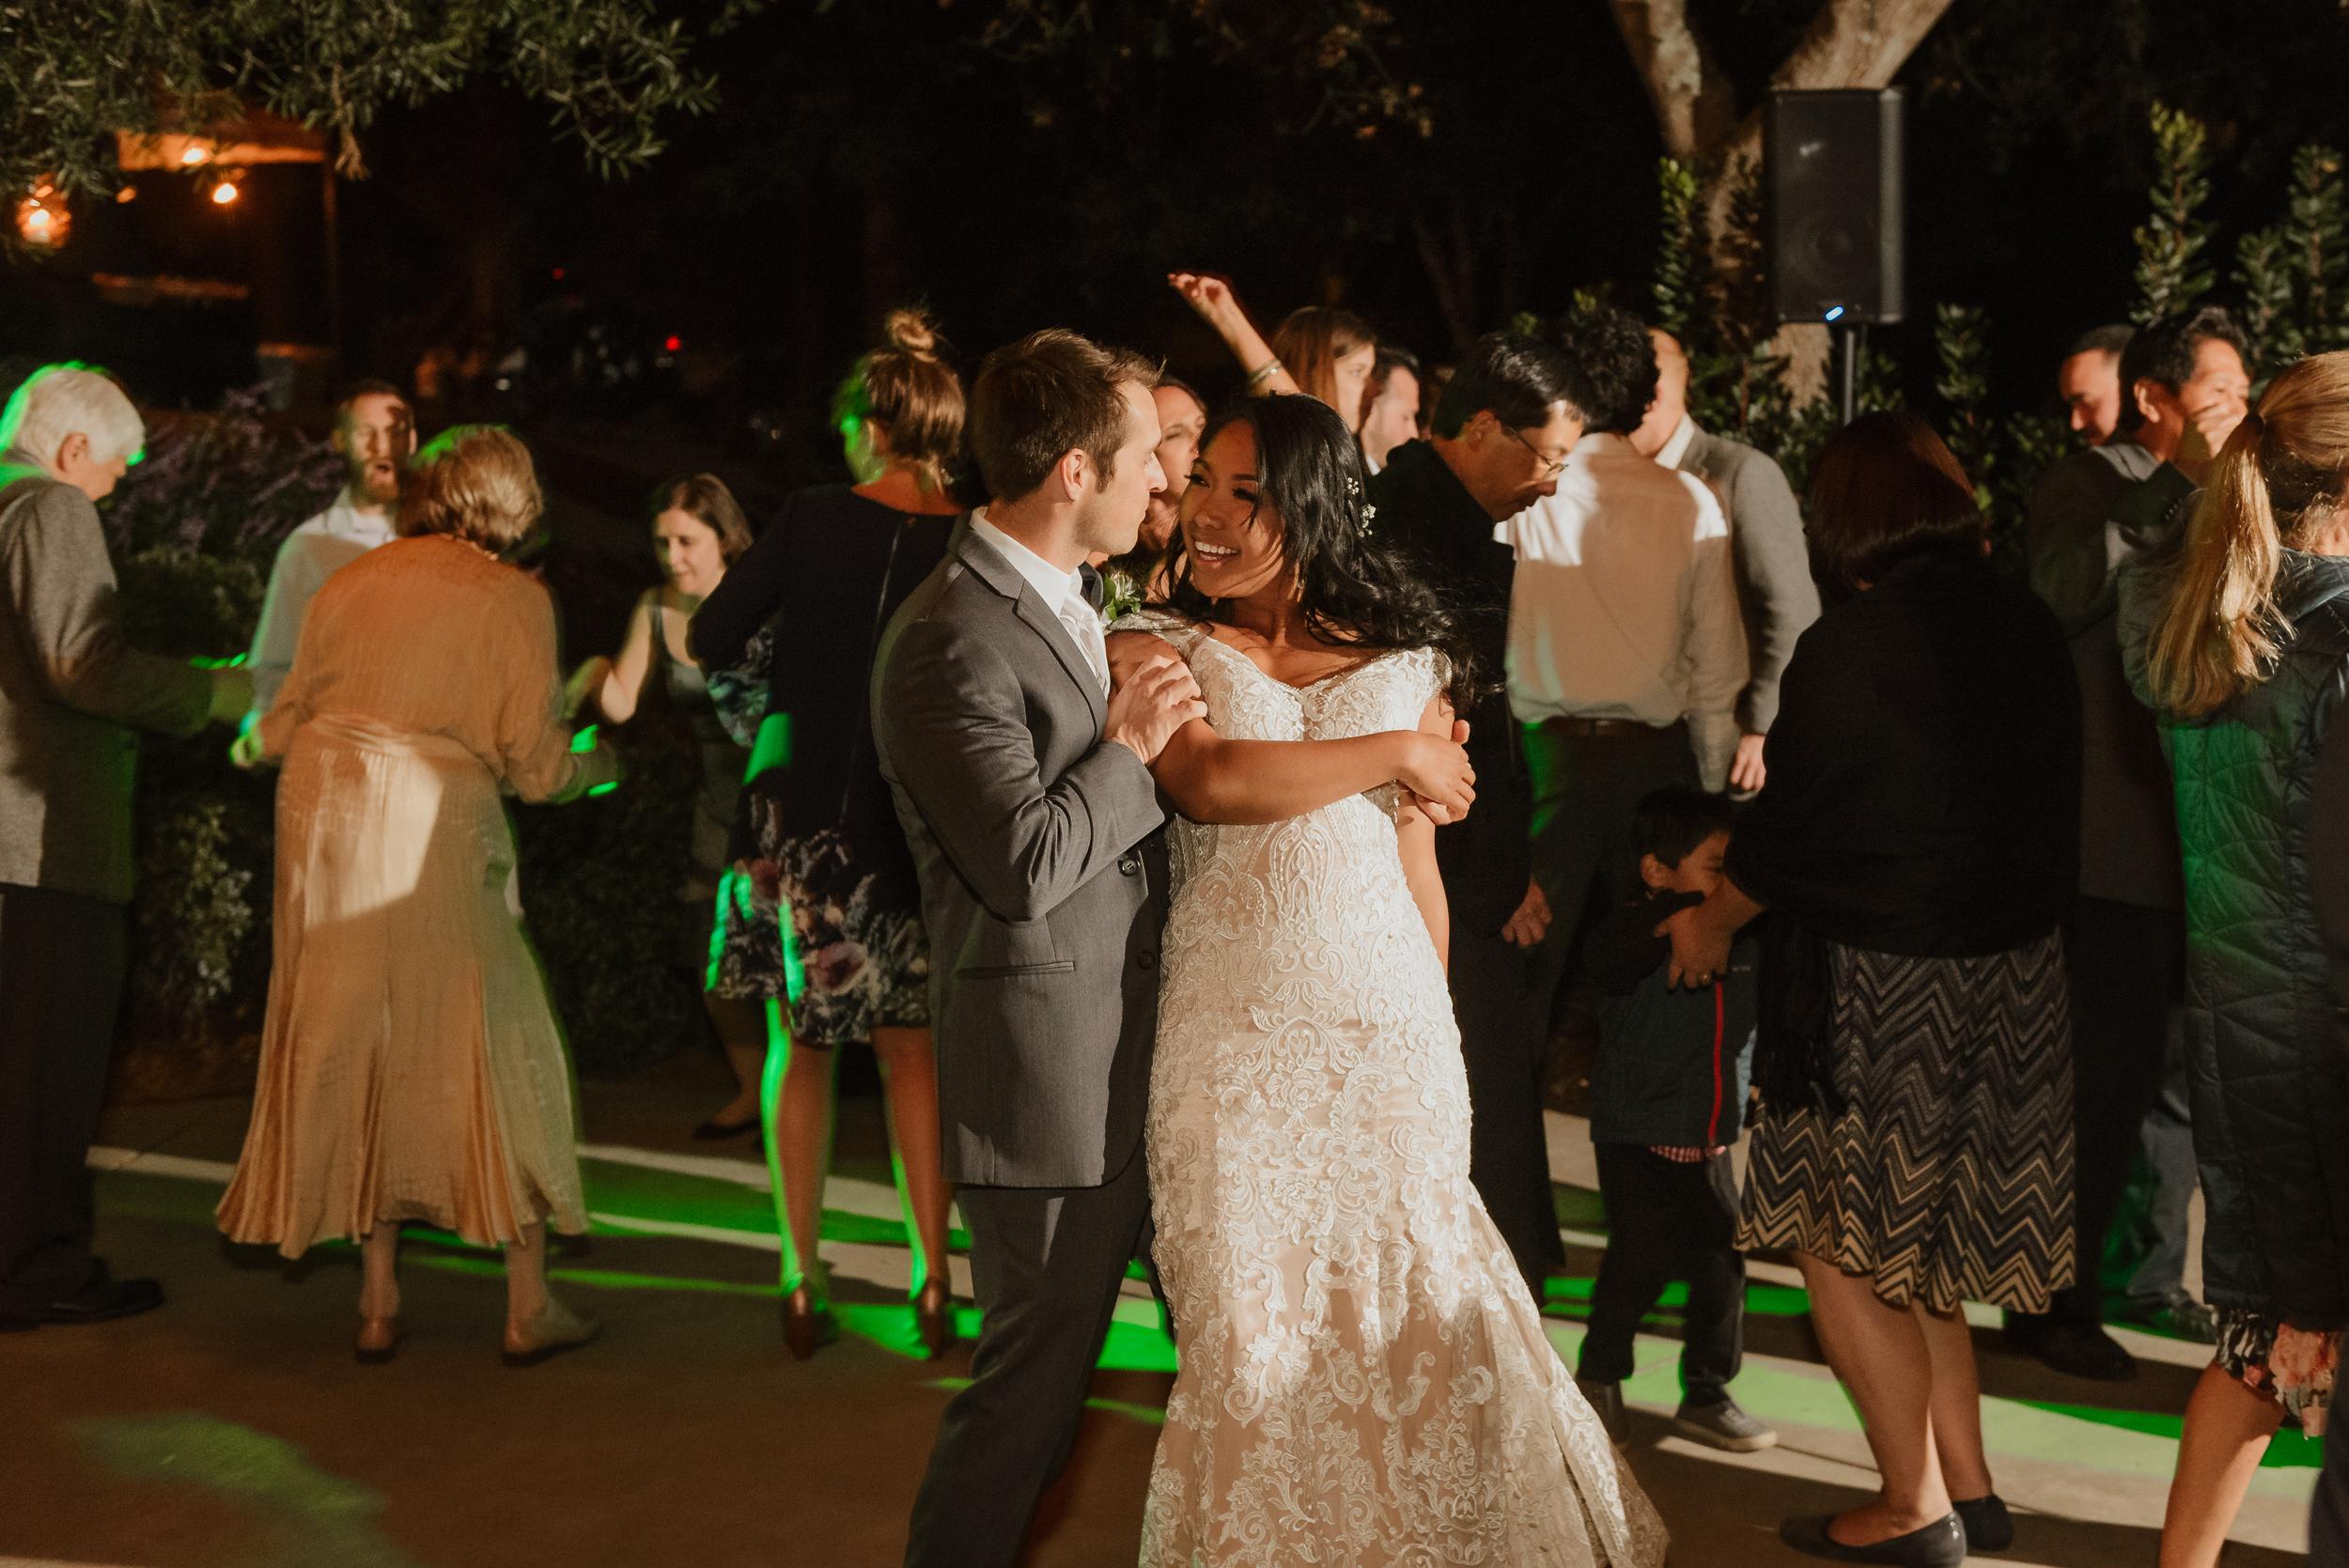 112marin-petaluma-backyard-wedding-vivianchen-697.jpg